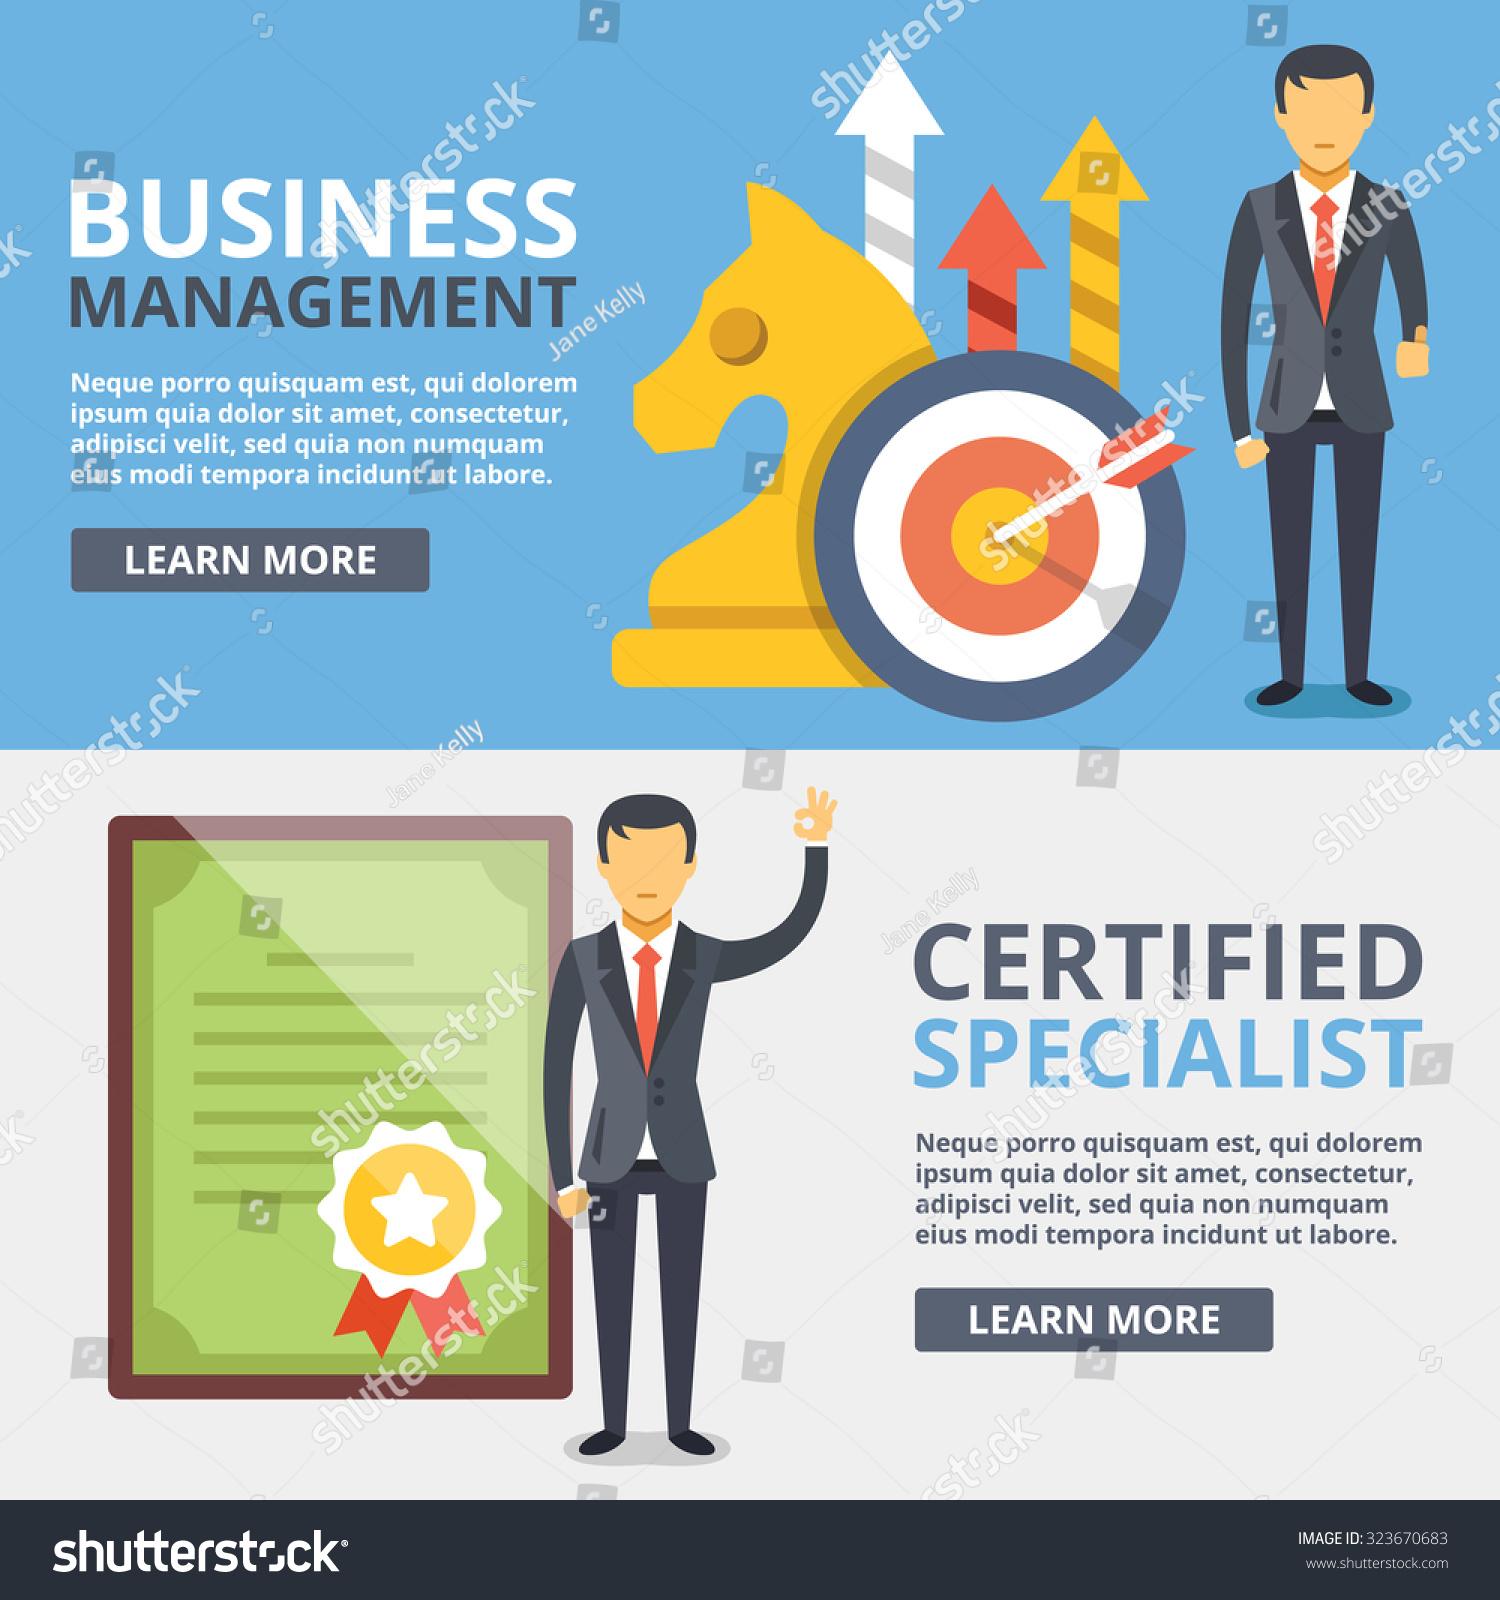 business management certified specialist flat